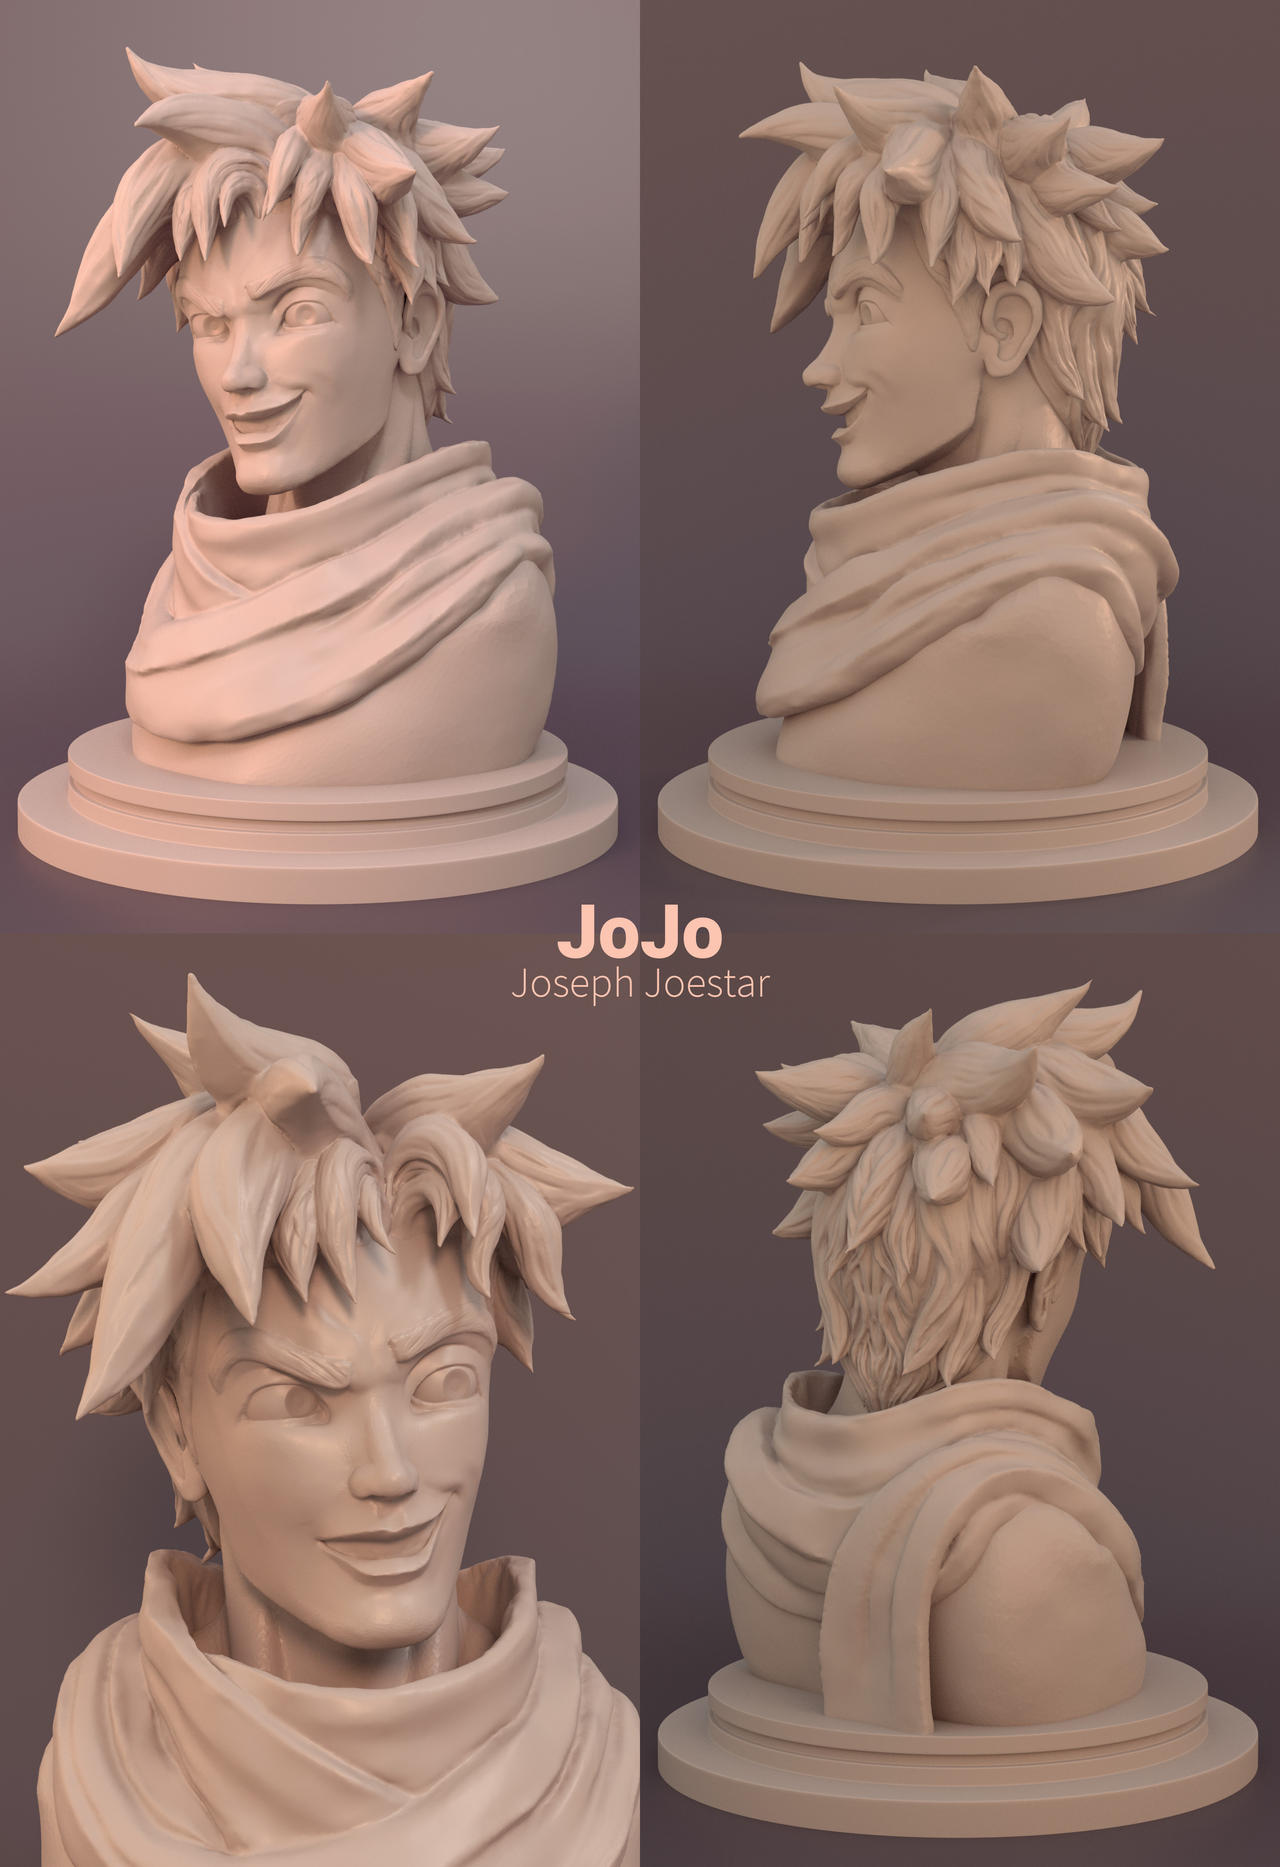 Joseph Joestar - JoJo Sculpt by tushantin